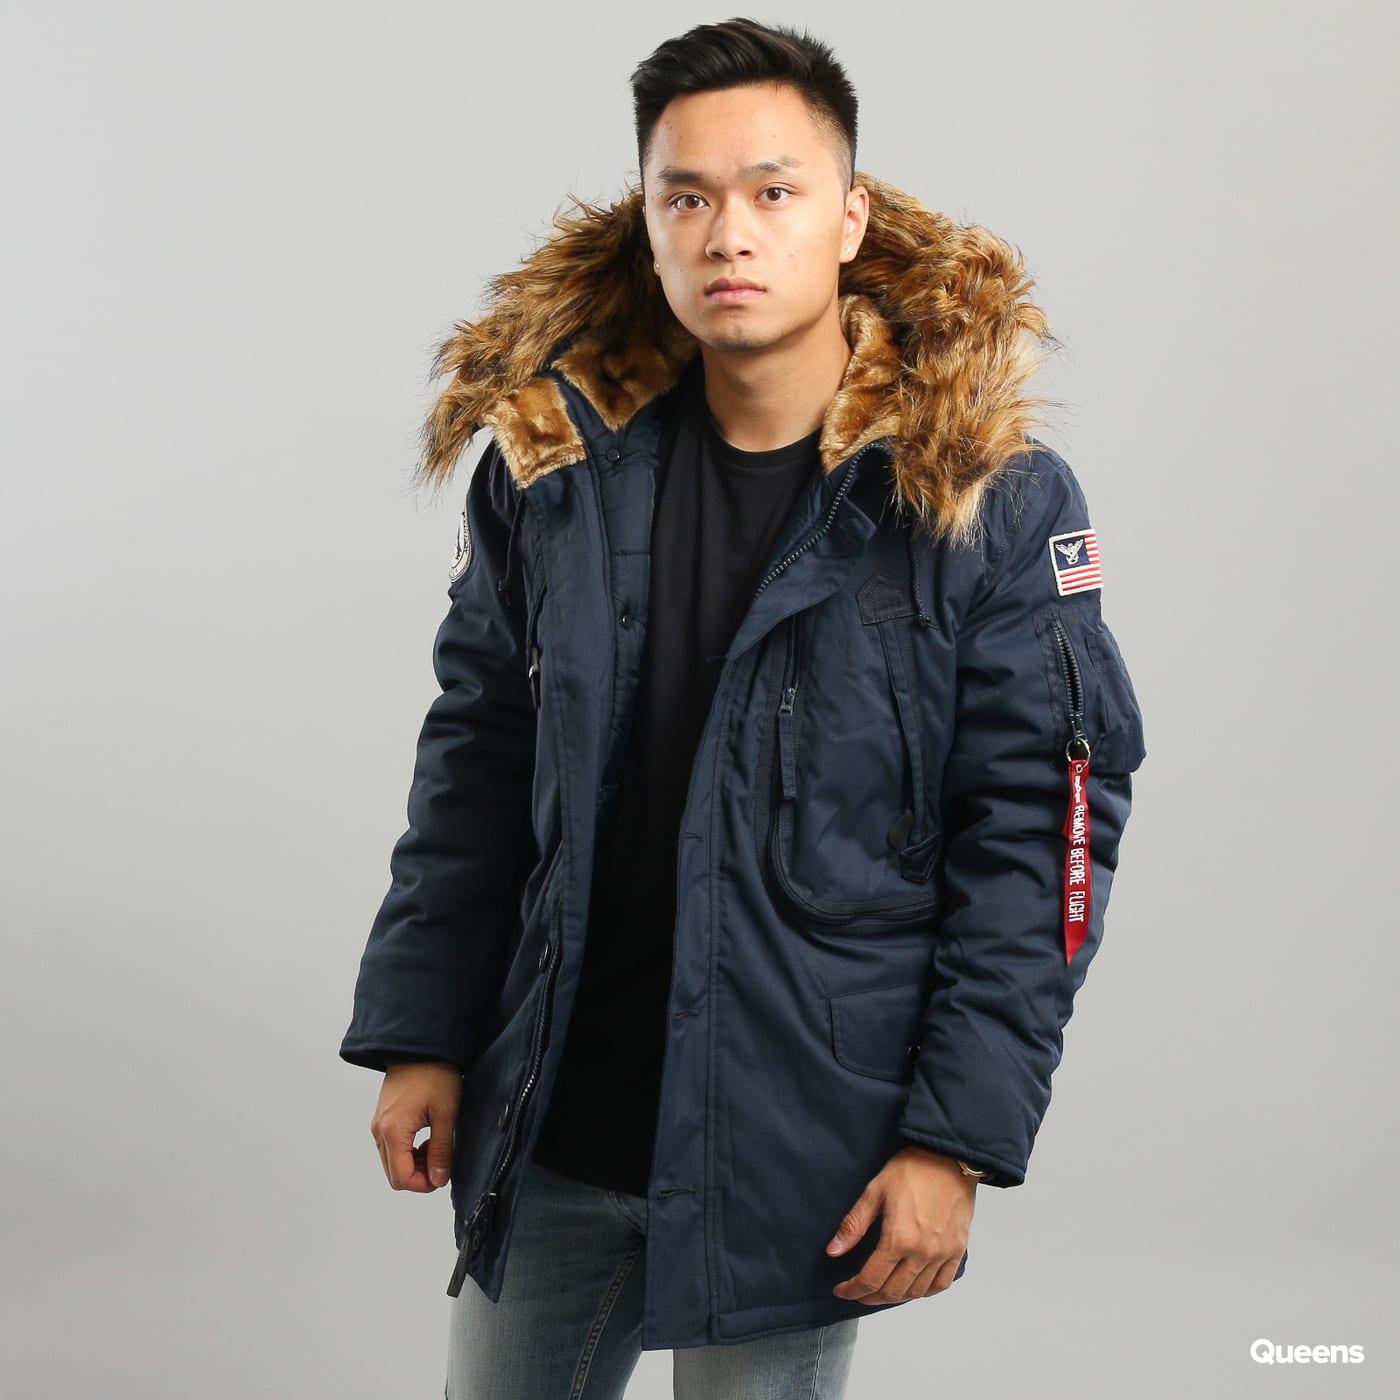 Pánská zimní bunda Alpha Industries Polar Jacket (123144 07) – Queens 💚 5b0bf29799